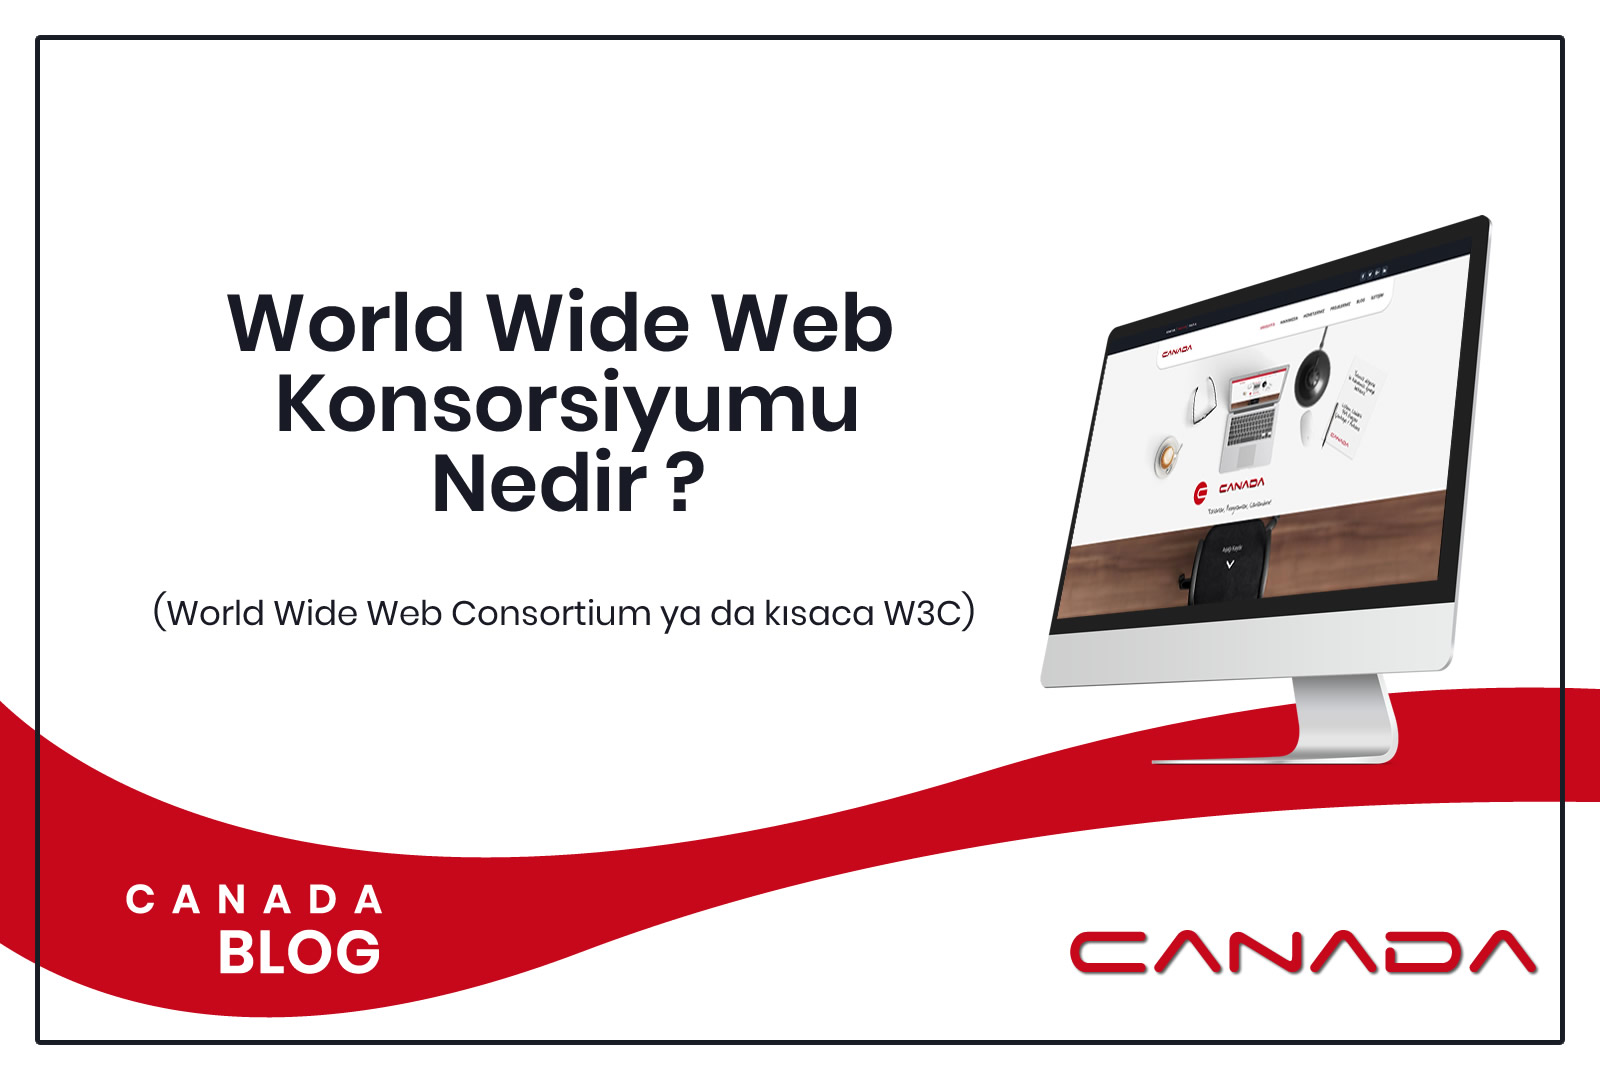 World Wide Web Konsorsiyumu Nedir?